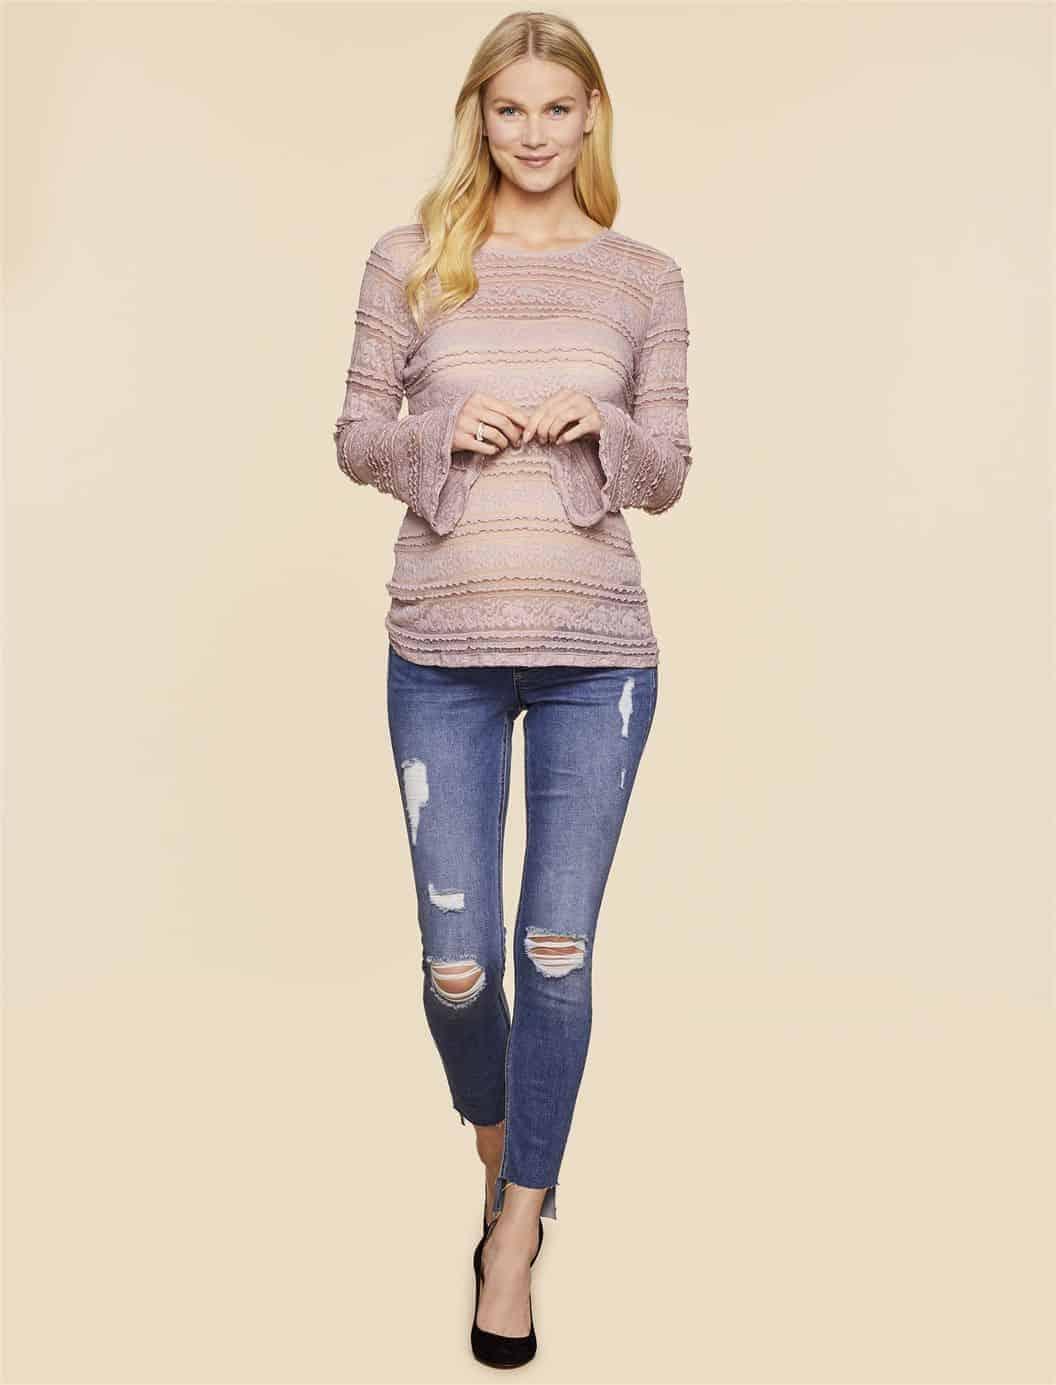 jessica simpson maternity jeans 2